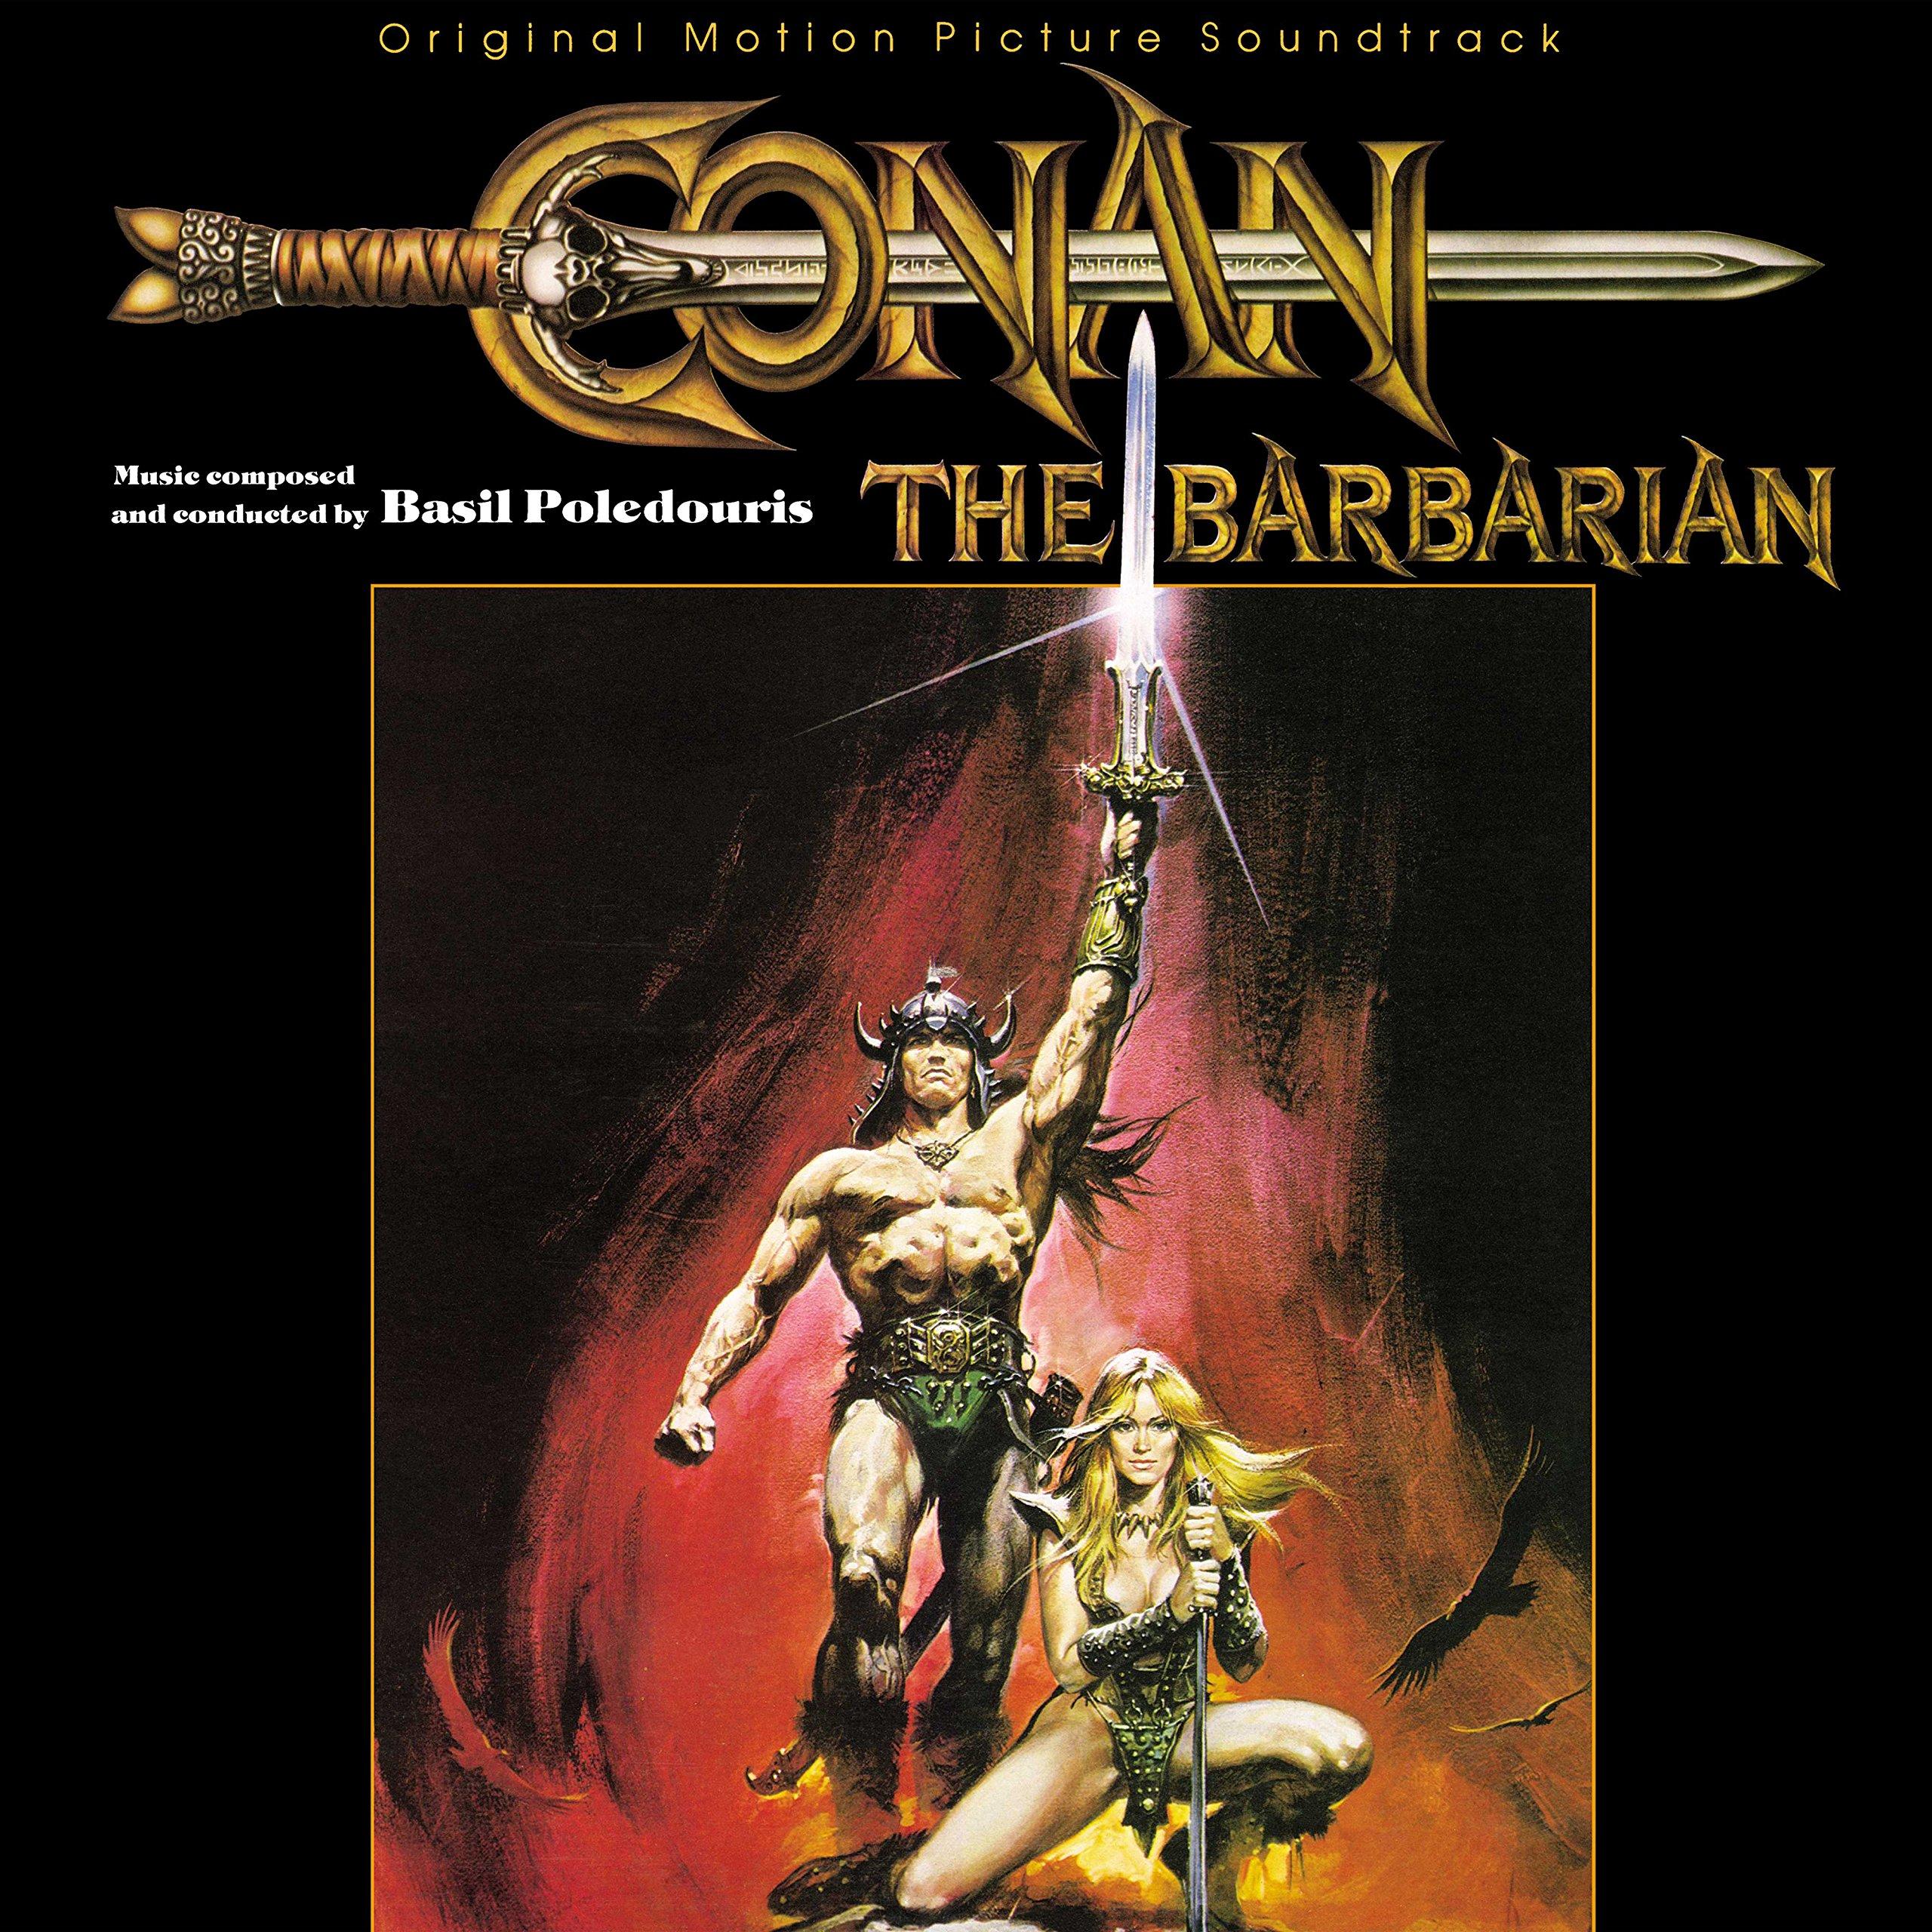 Vinilo : Soundtrack - Conan the Barbarian (LP Vinyl)